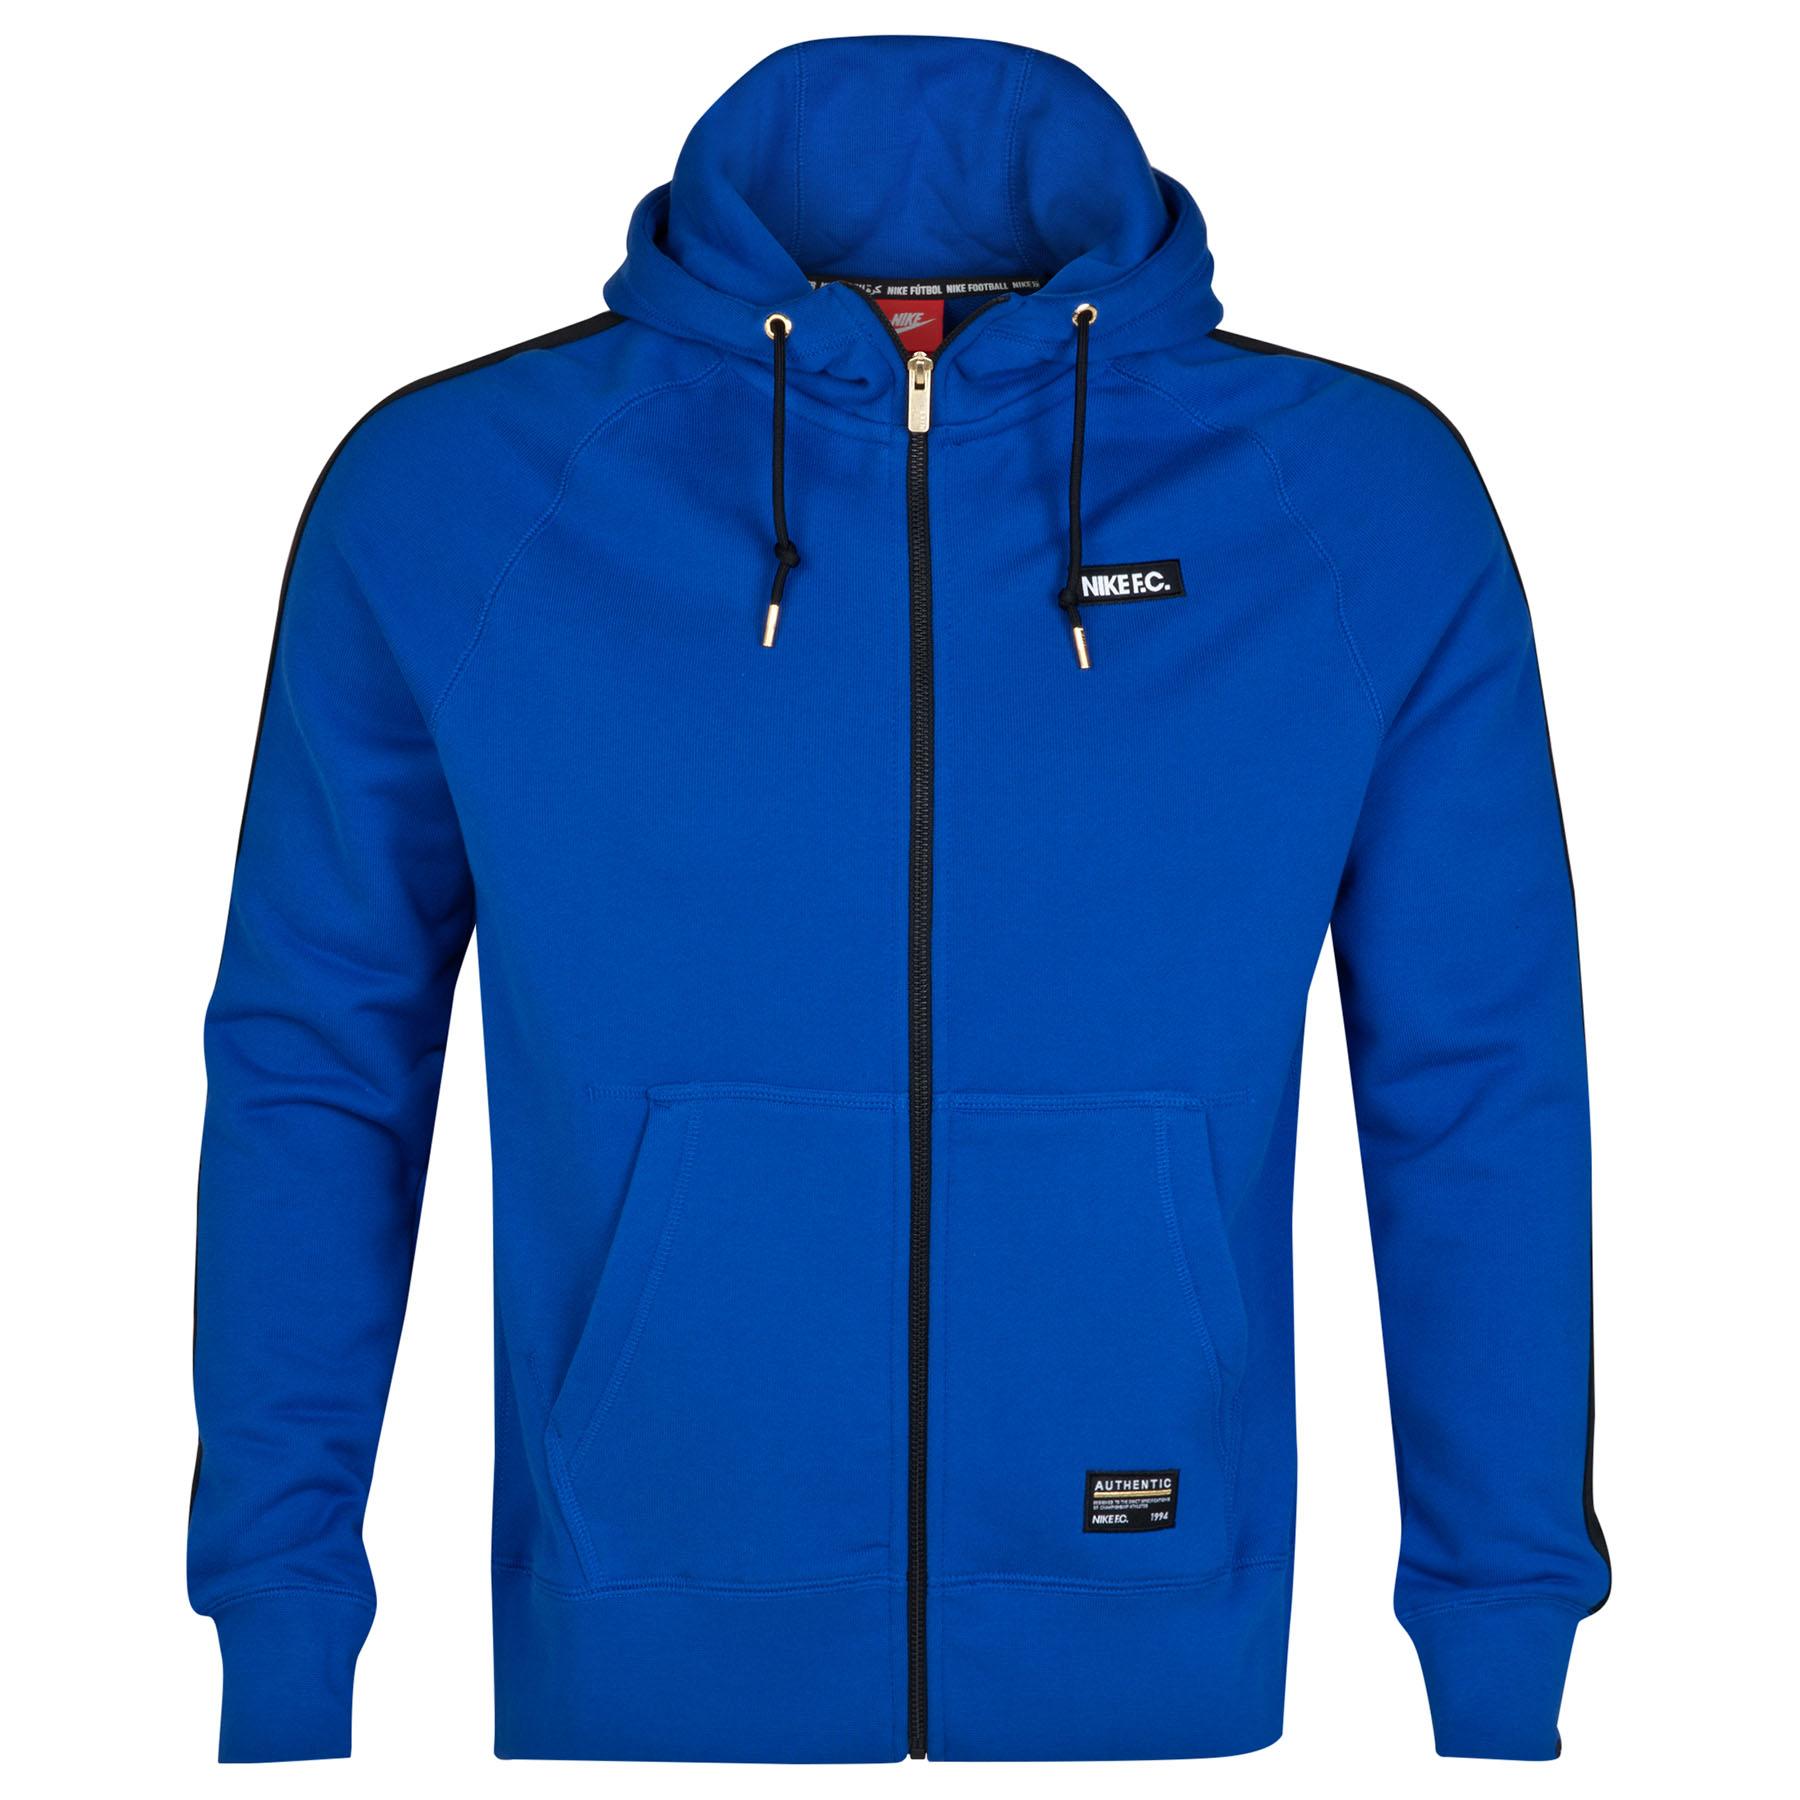 Manchester City AW77 Full Zip Hoody Royal Blue